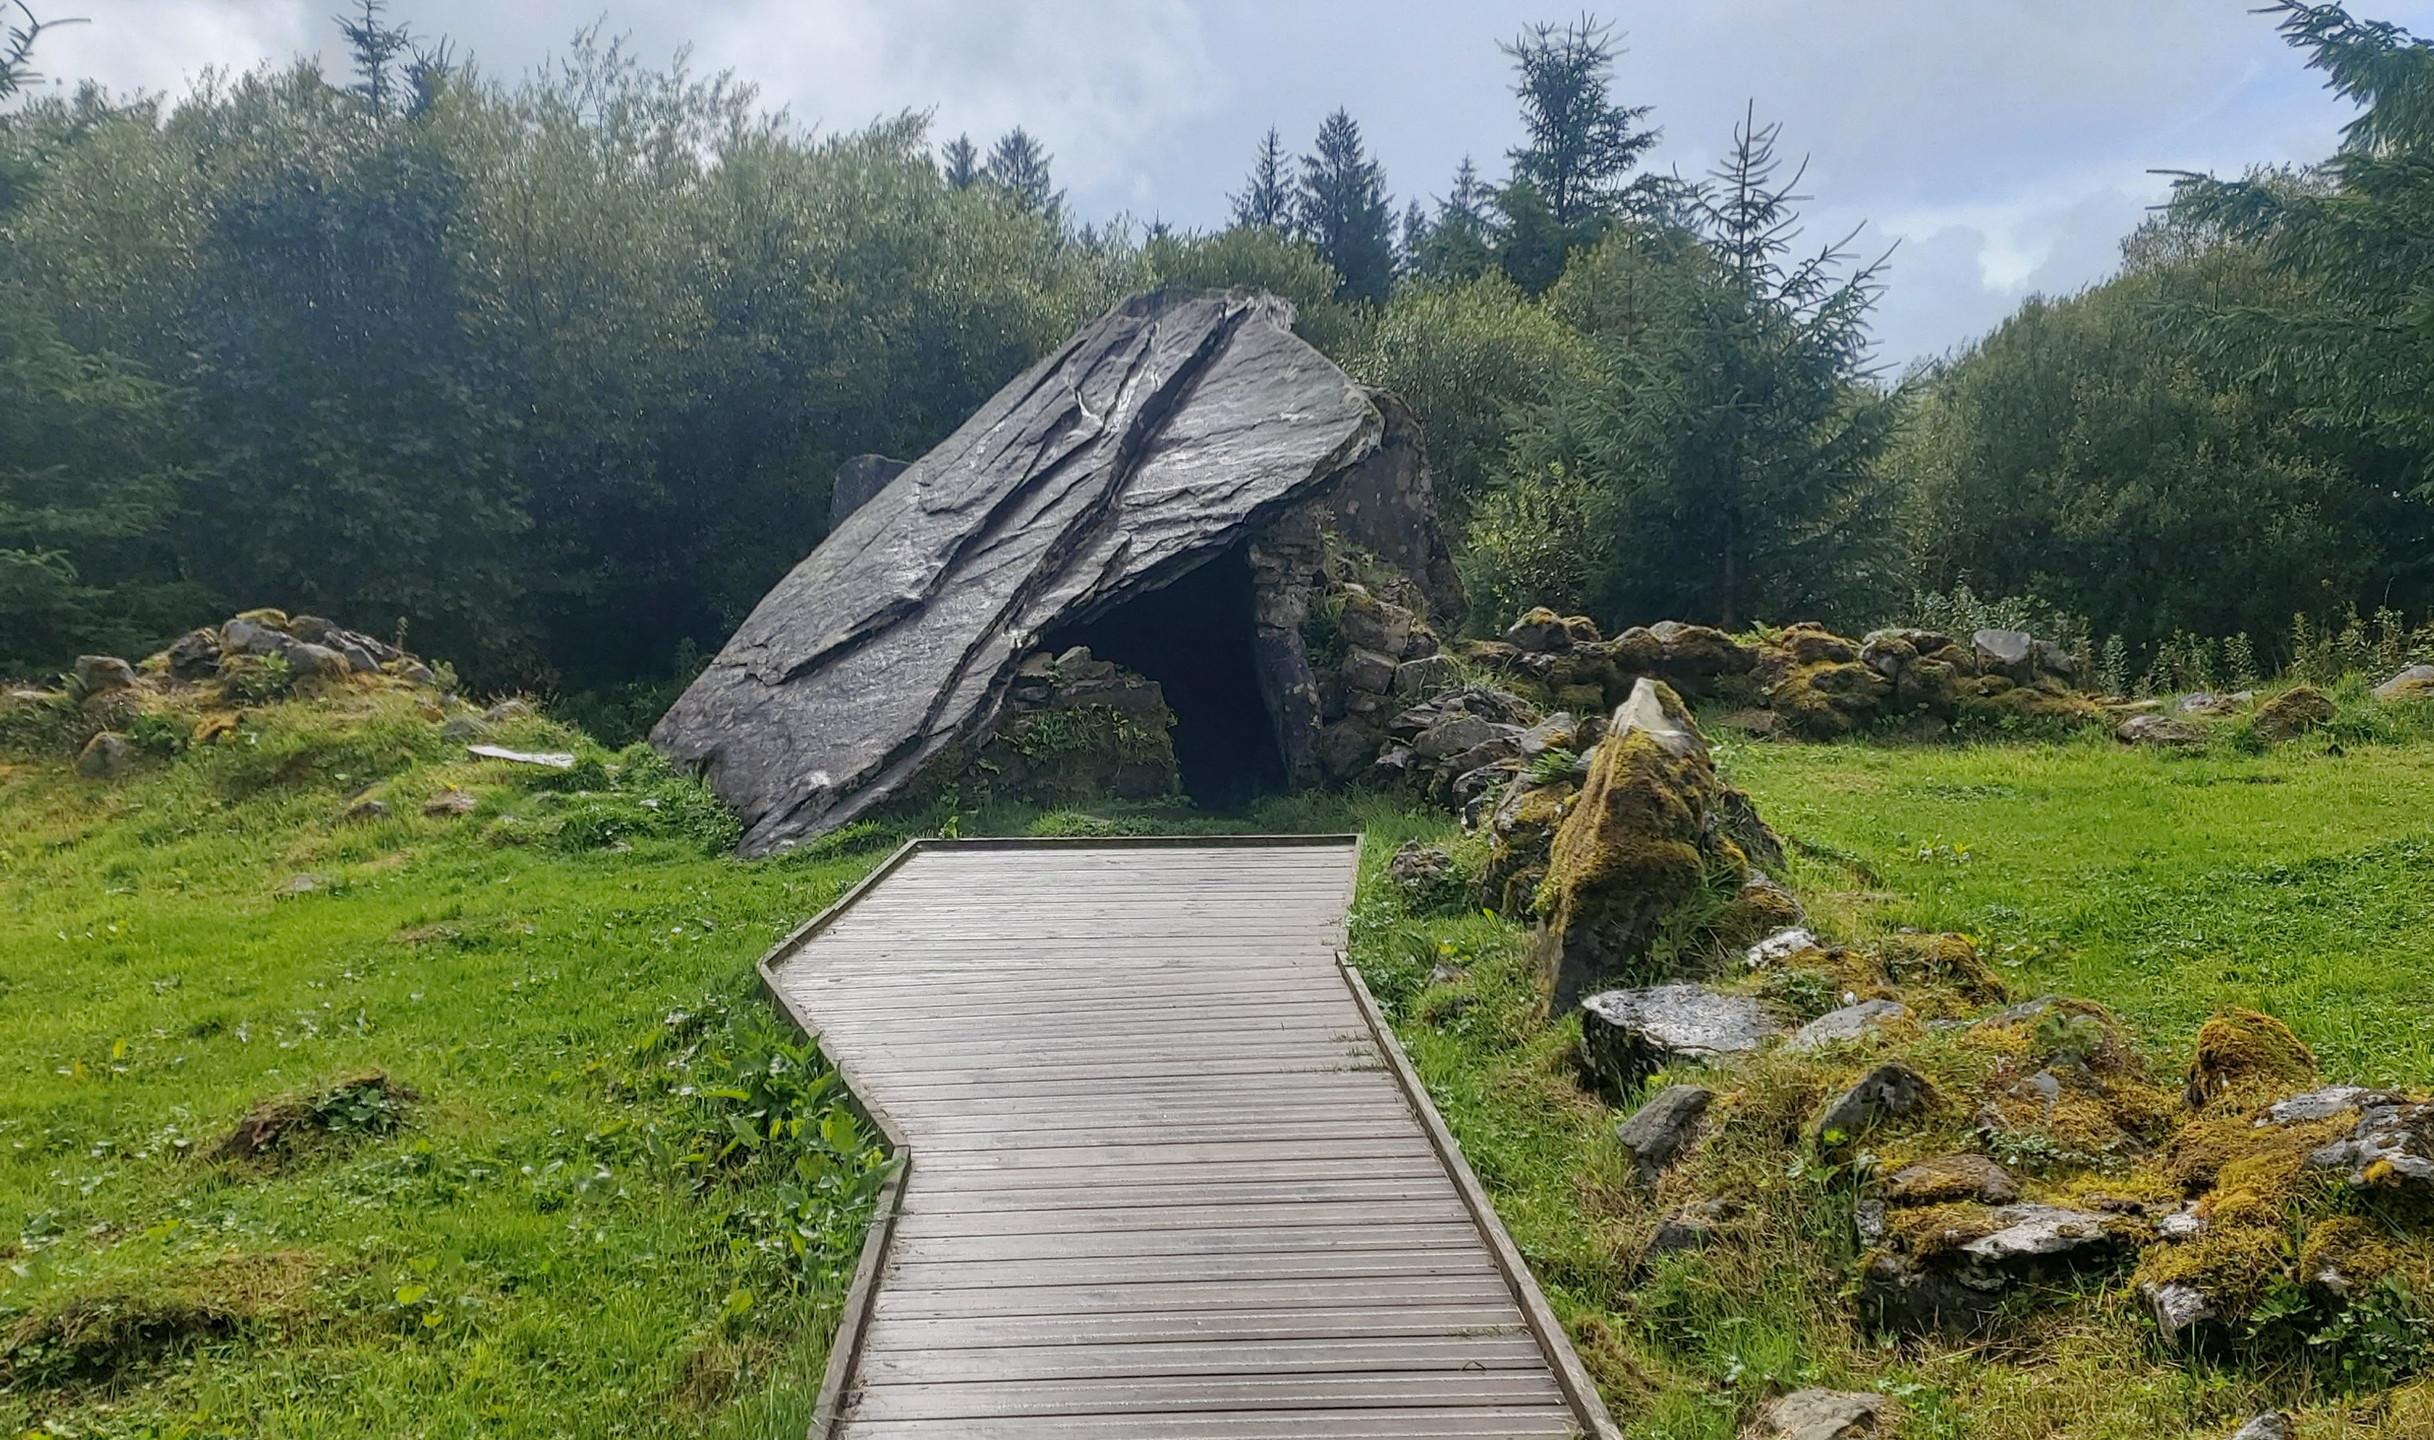 Approach to Calf House Dolmen